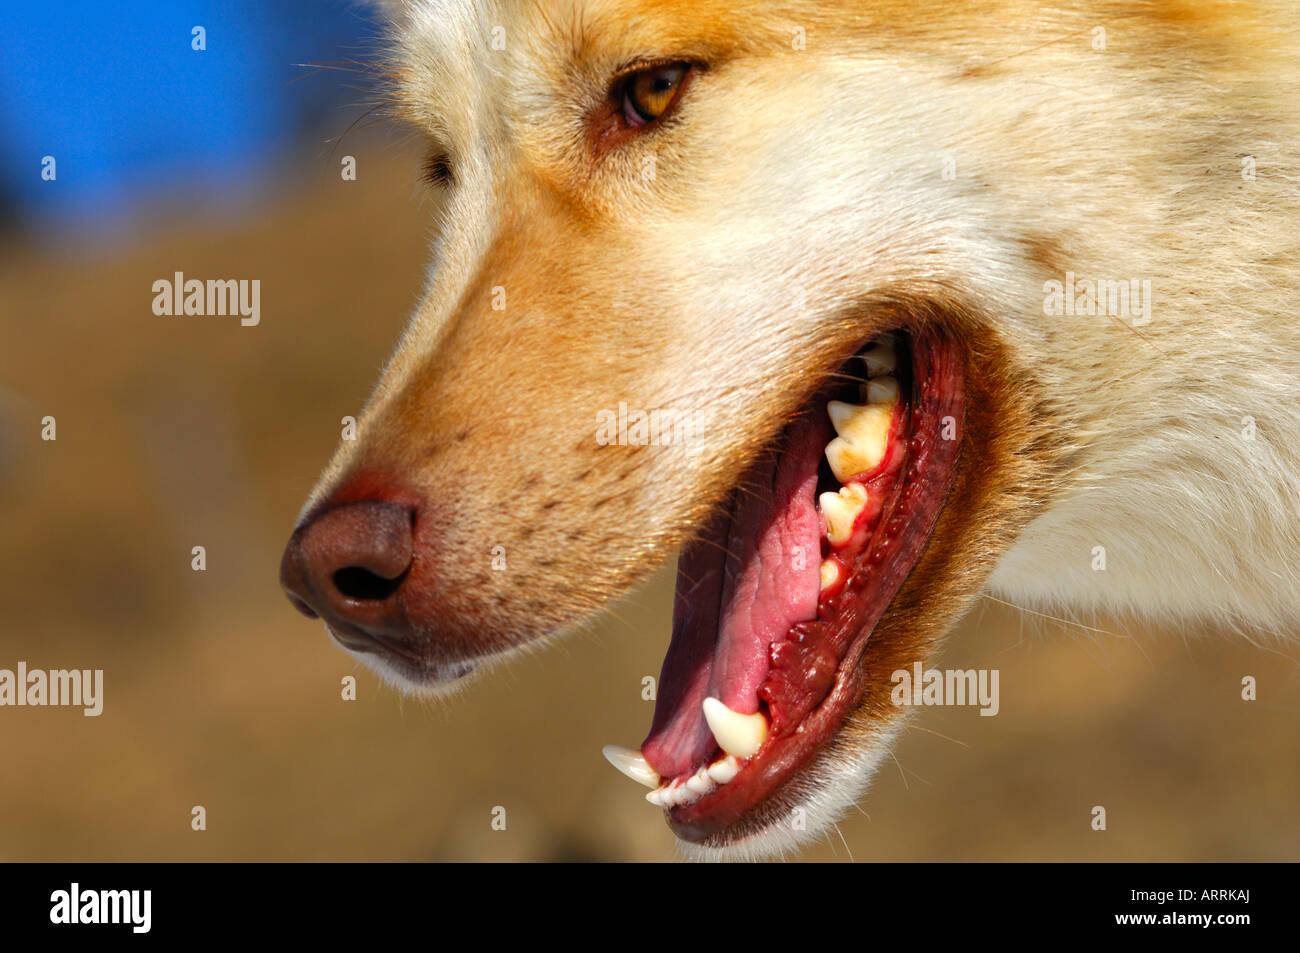 Teeth denture snout Greenland Dog sledge dog sled dog - Stock Image